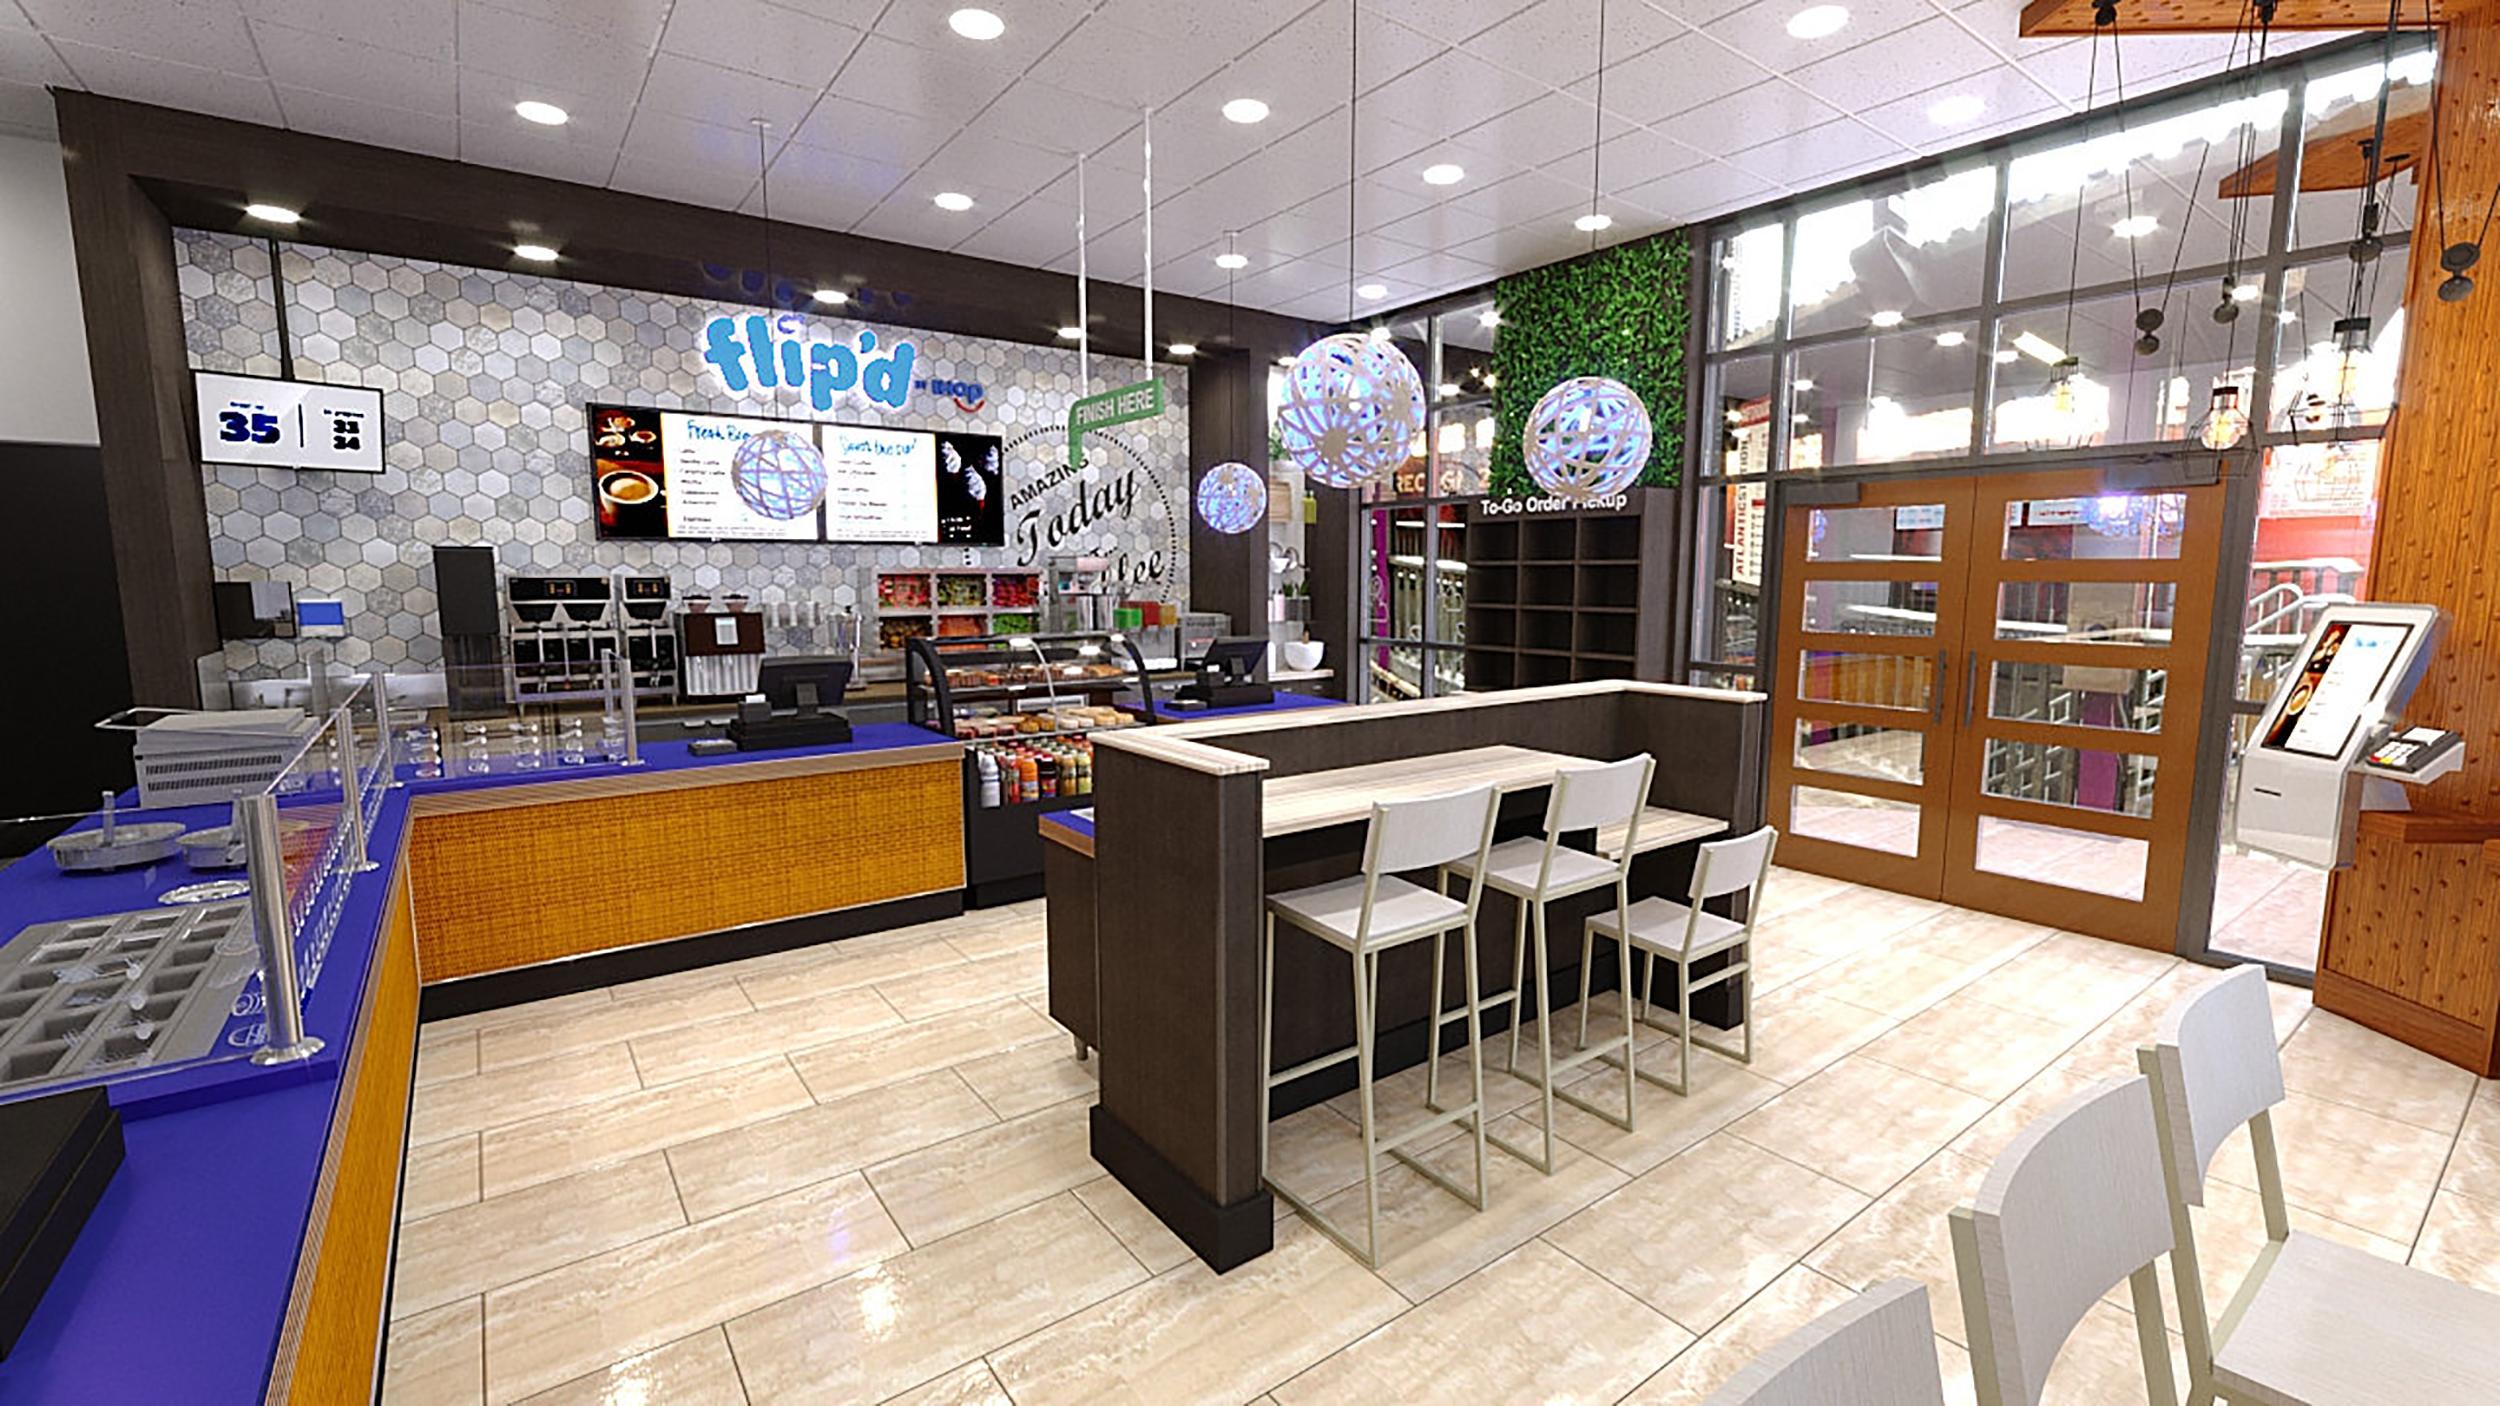 A rendering of a Flip'd by IHOP restaurant. (Credit: IHOP)